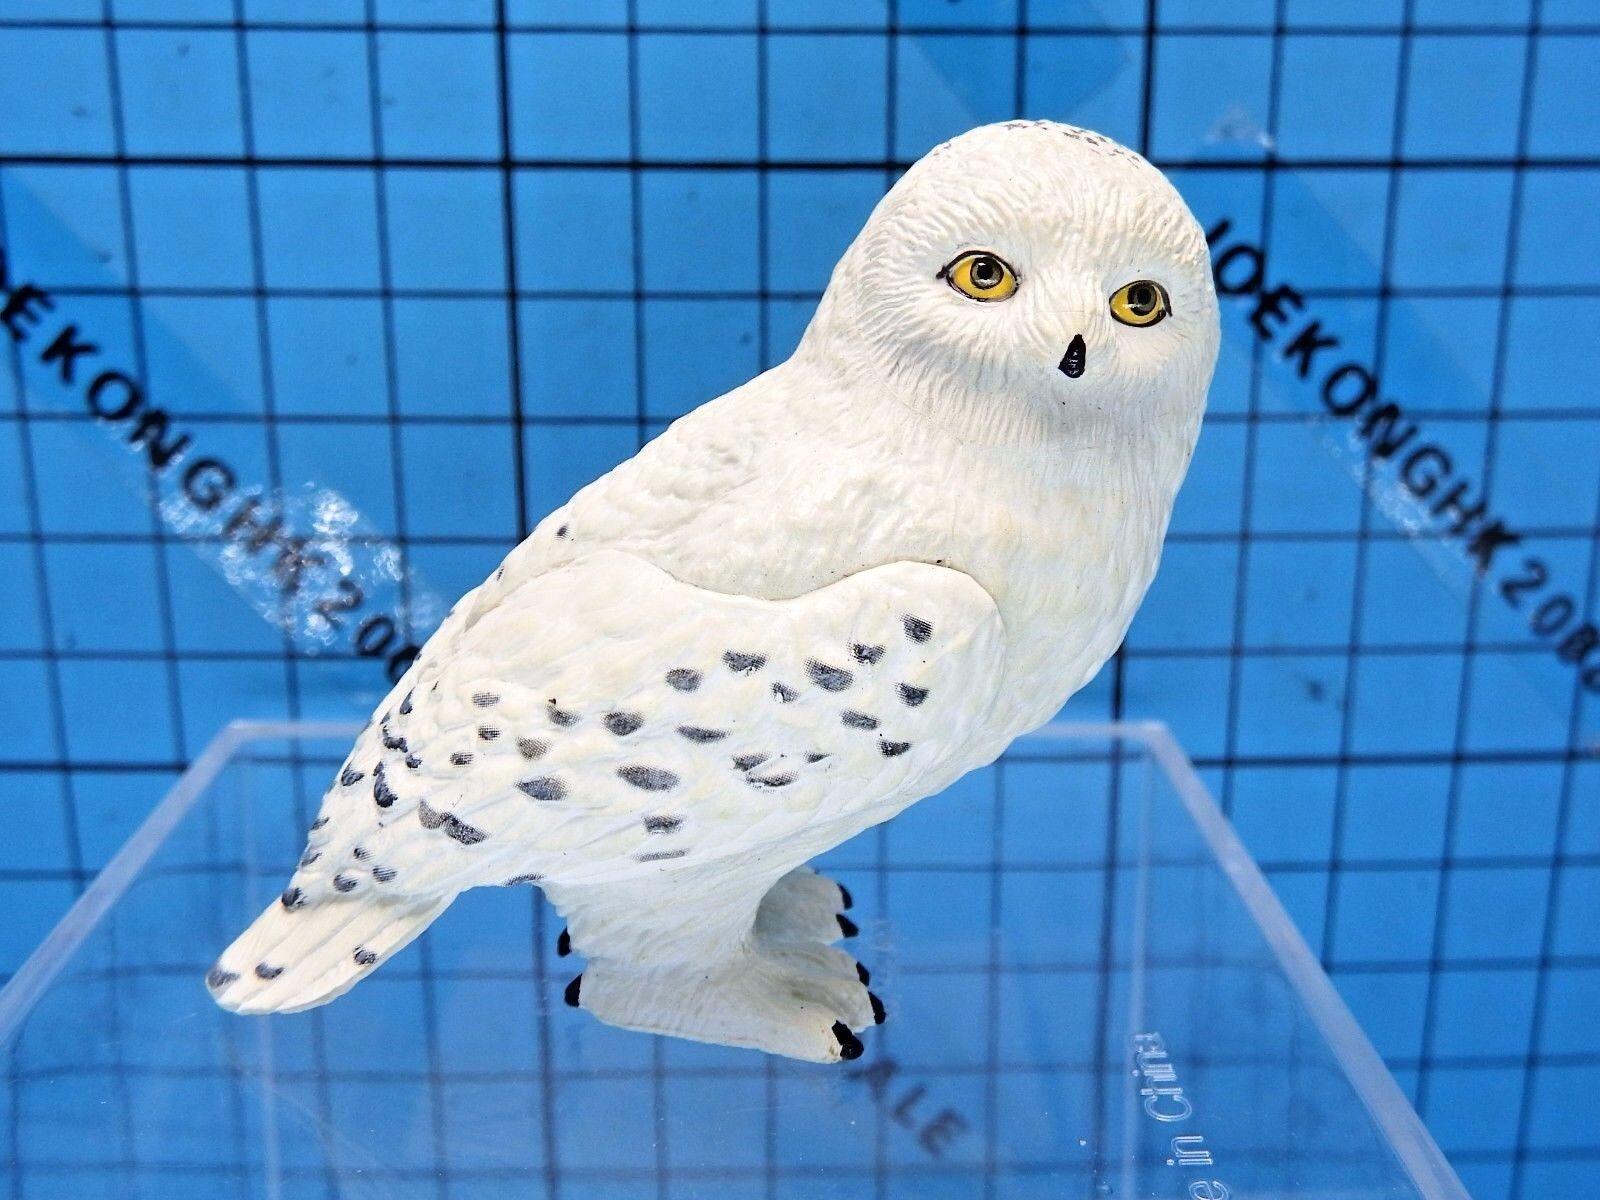 Star Ace Toys 1:6 Harry Potter Rubeus Hagrid Figure - Hedwig/Owl